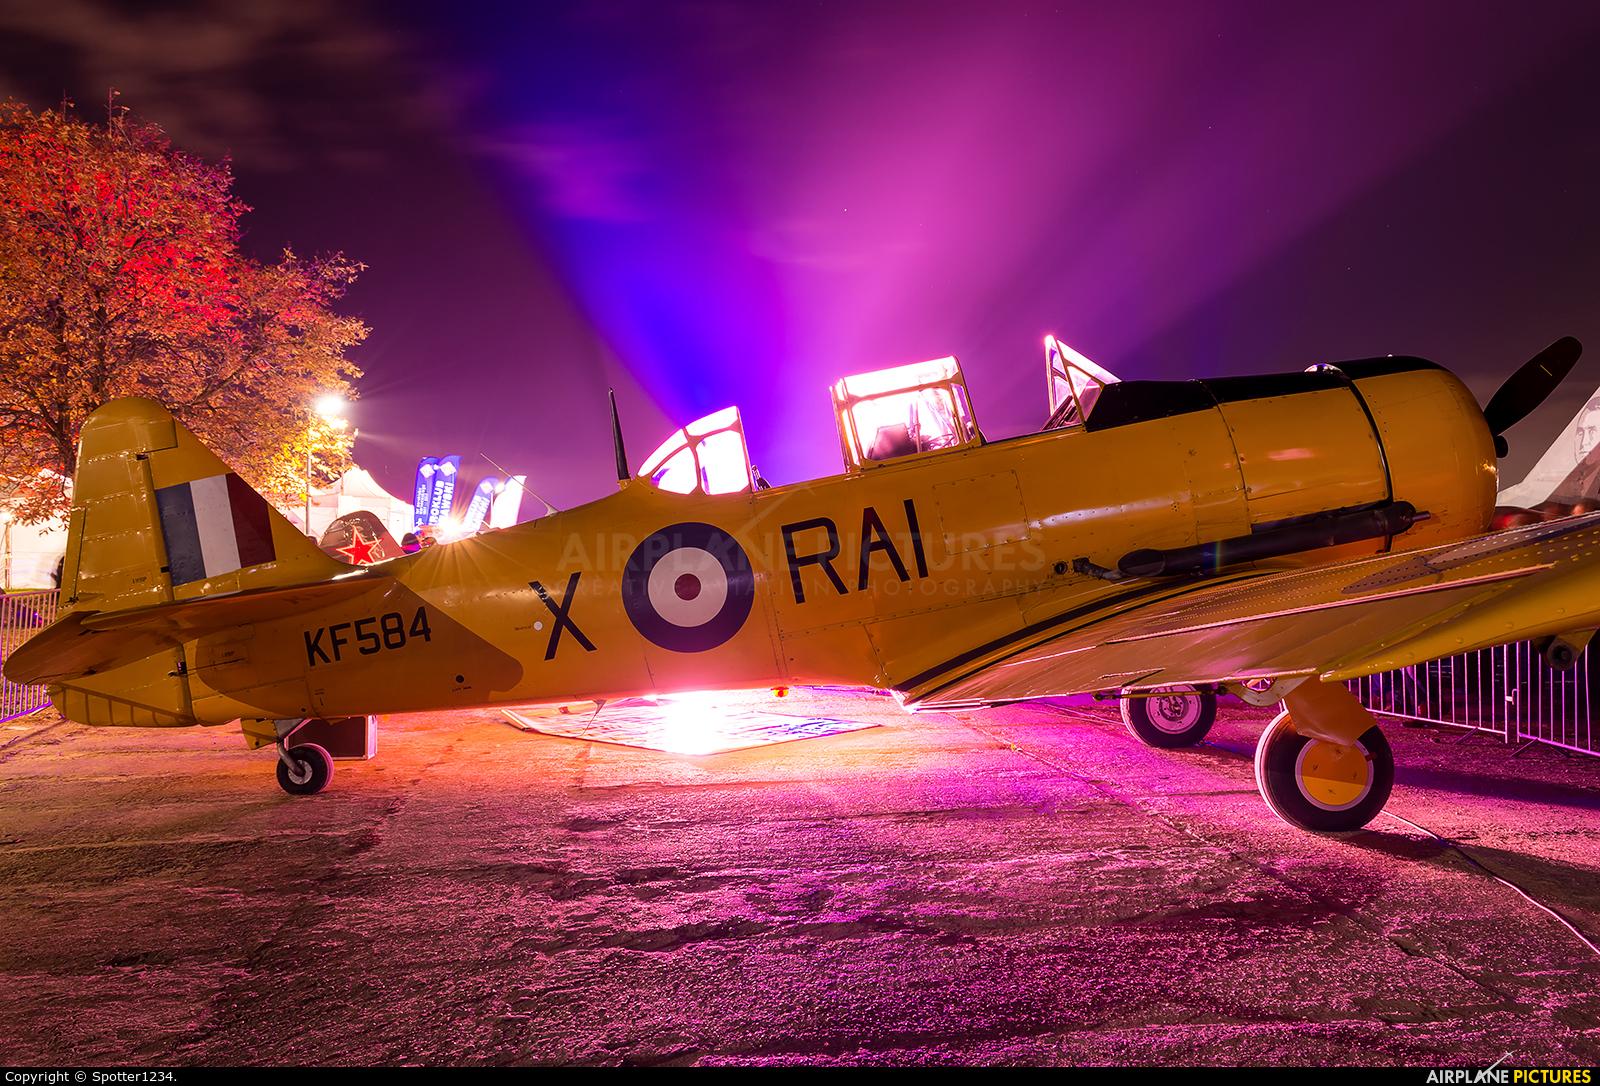 North American Airlines KF584 aircraft at Warsaw - Frederic Chopin